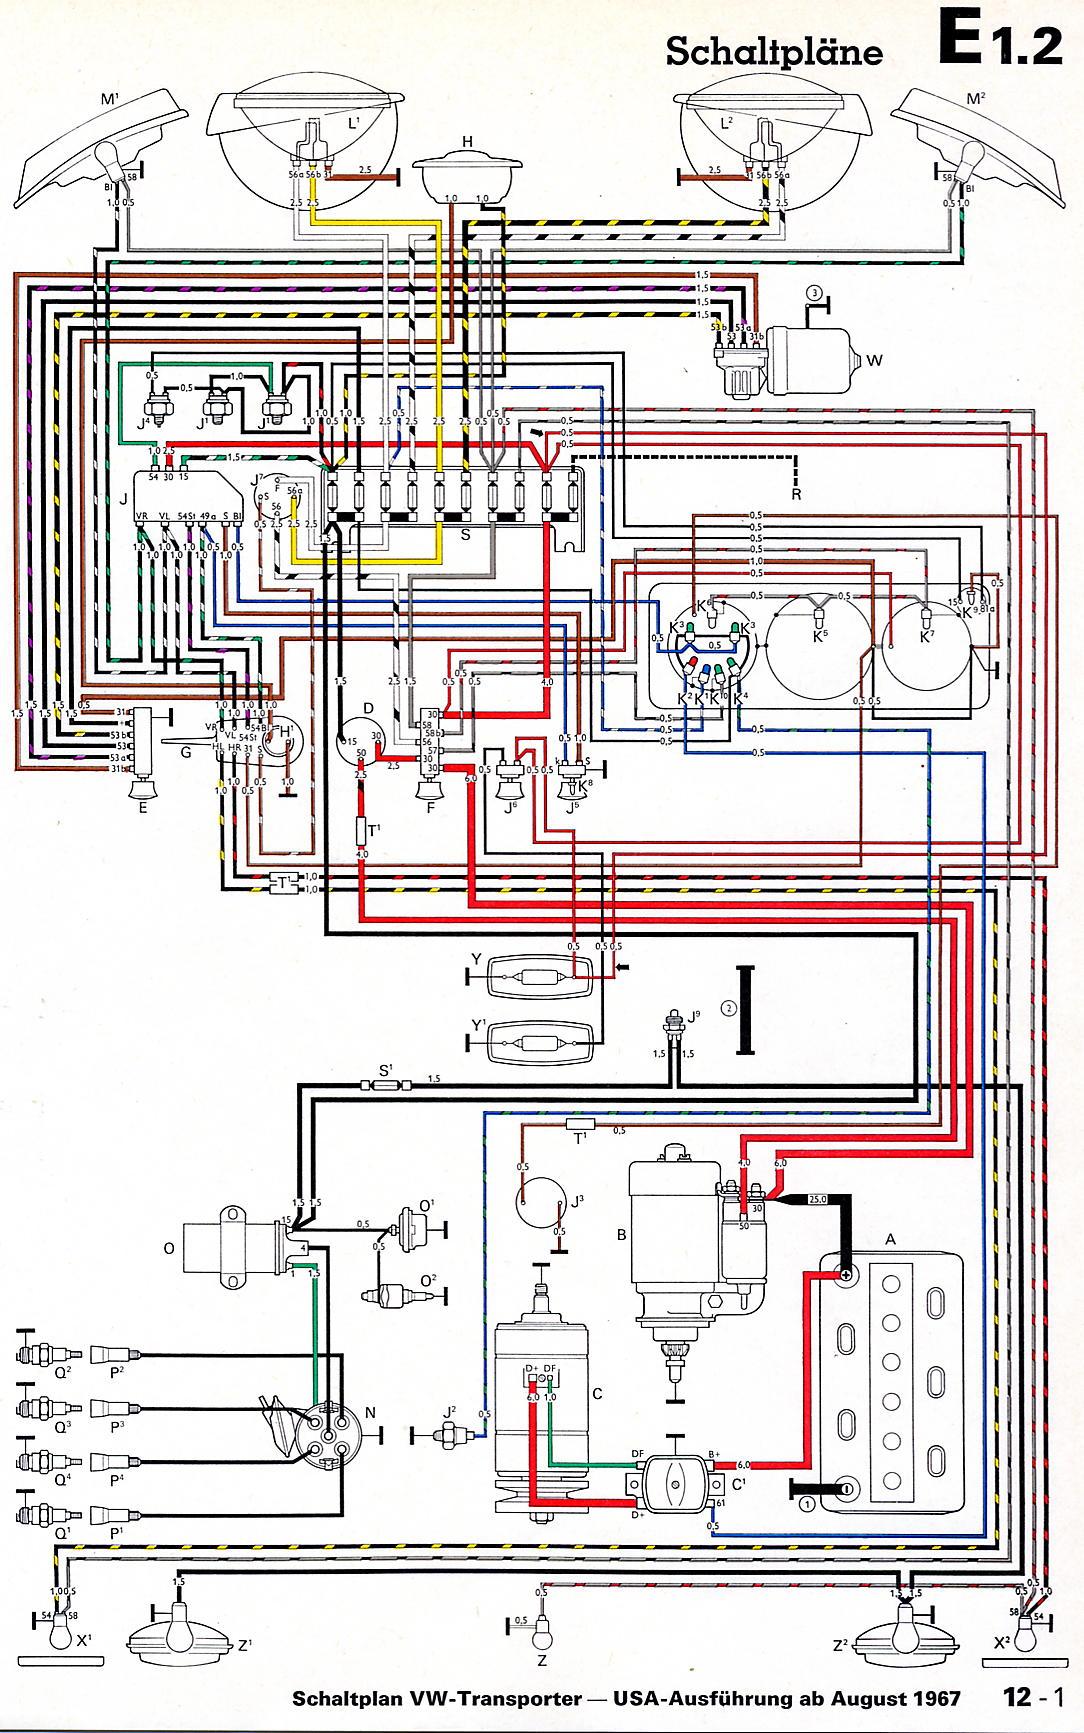 vw t4 wiring diagram aiphone c ml t horn volkswagen transporter fuse